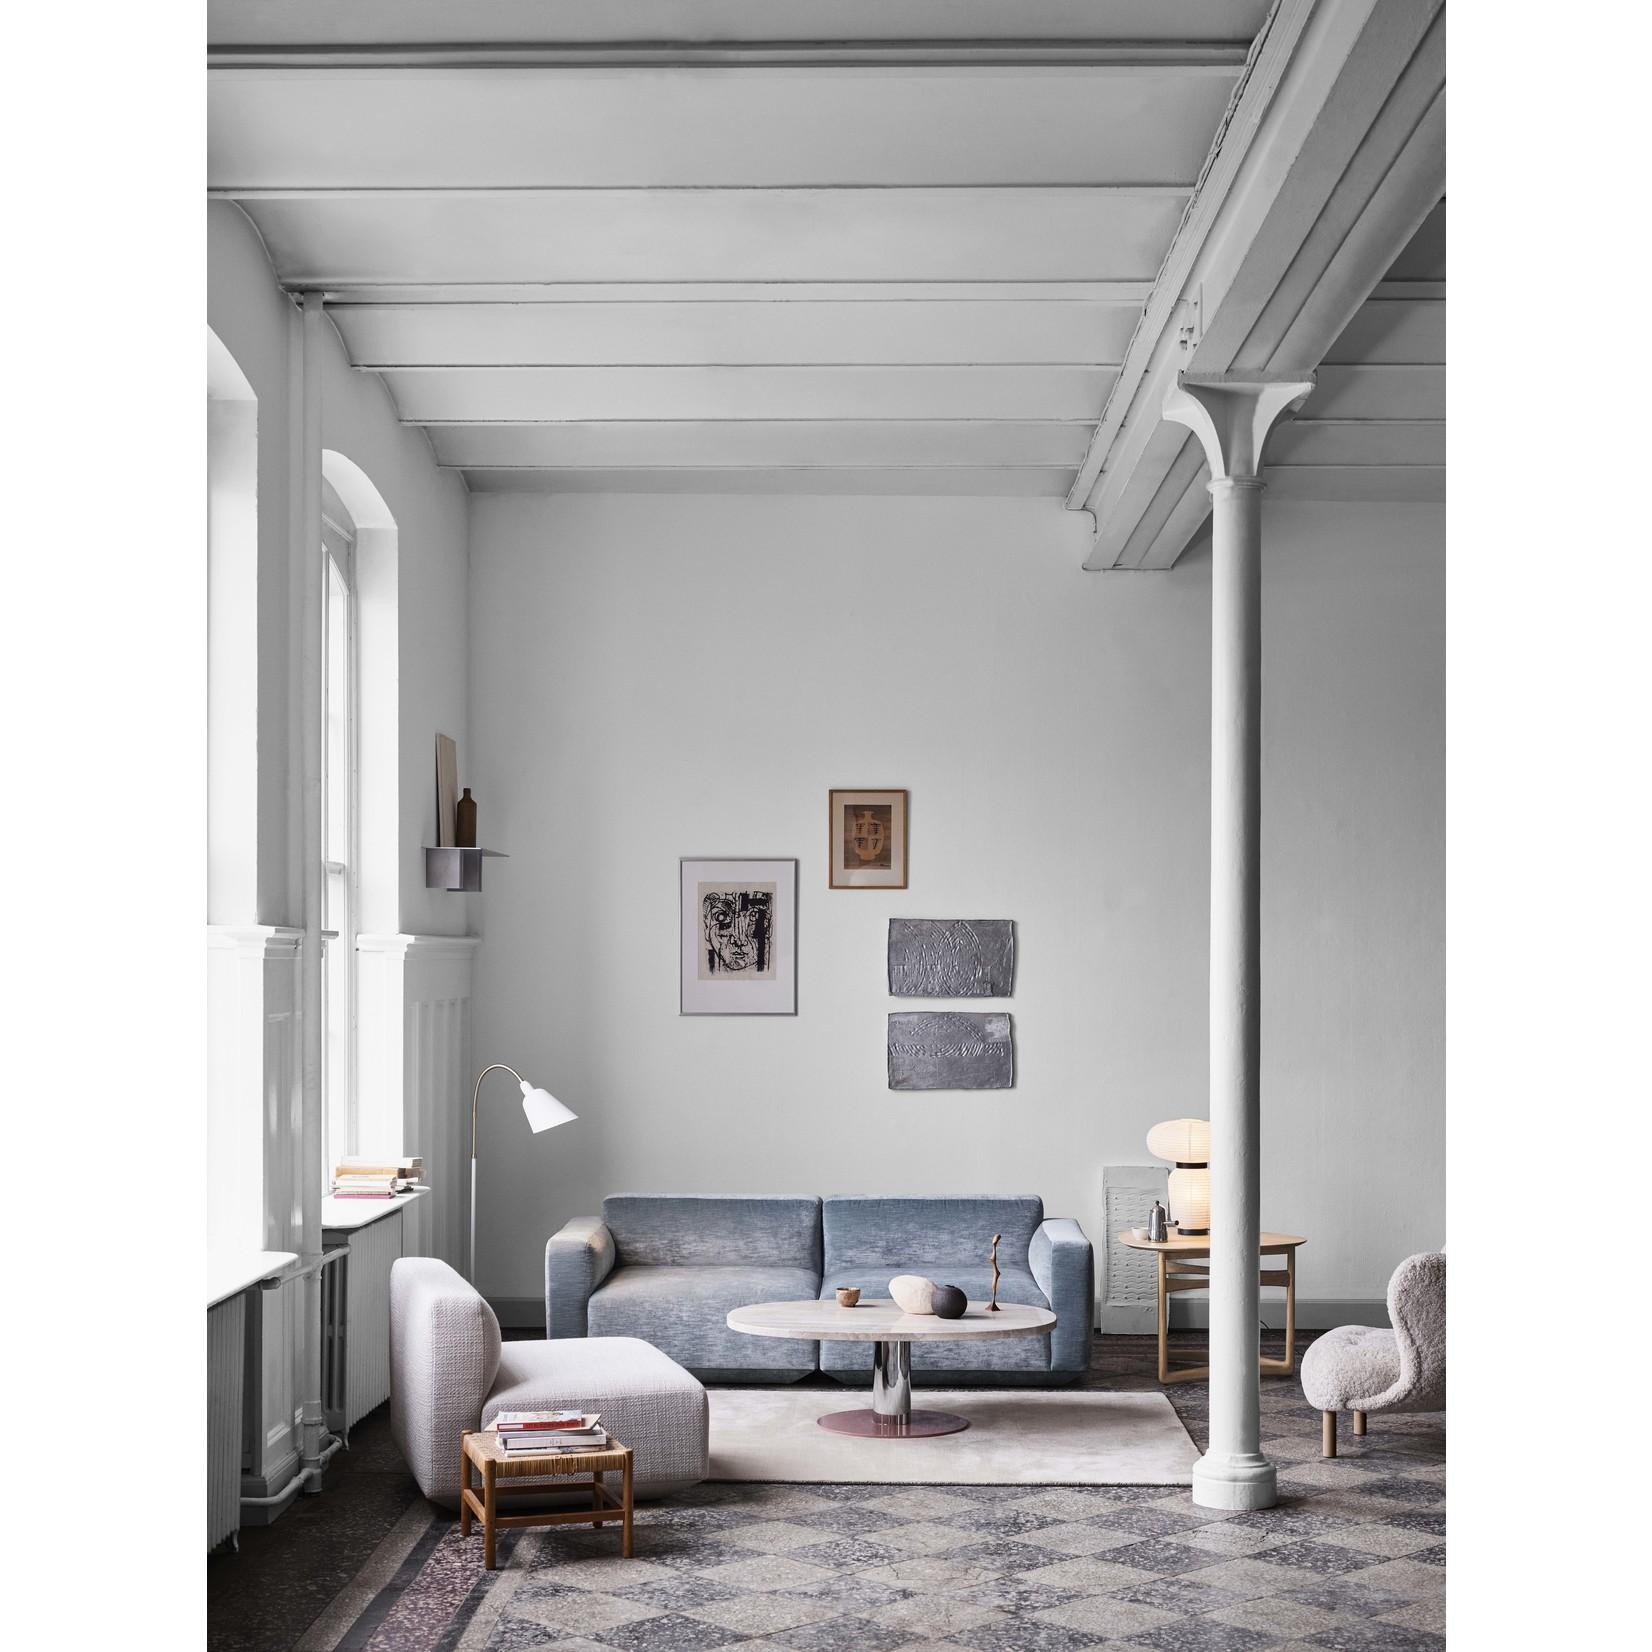 &Tradition The Moor AP7 | Rosée Beige 200x300cm